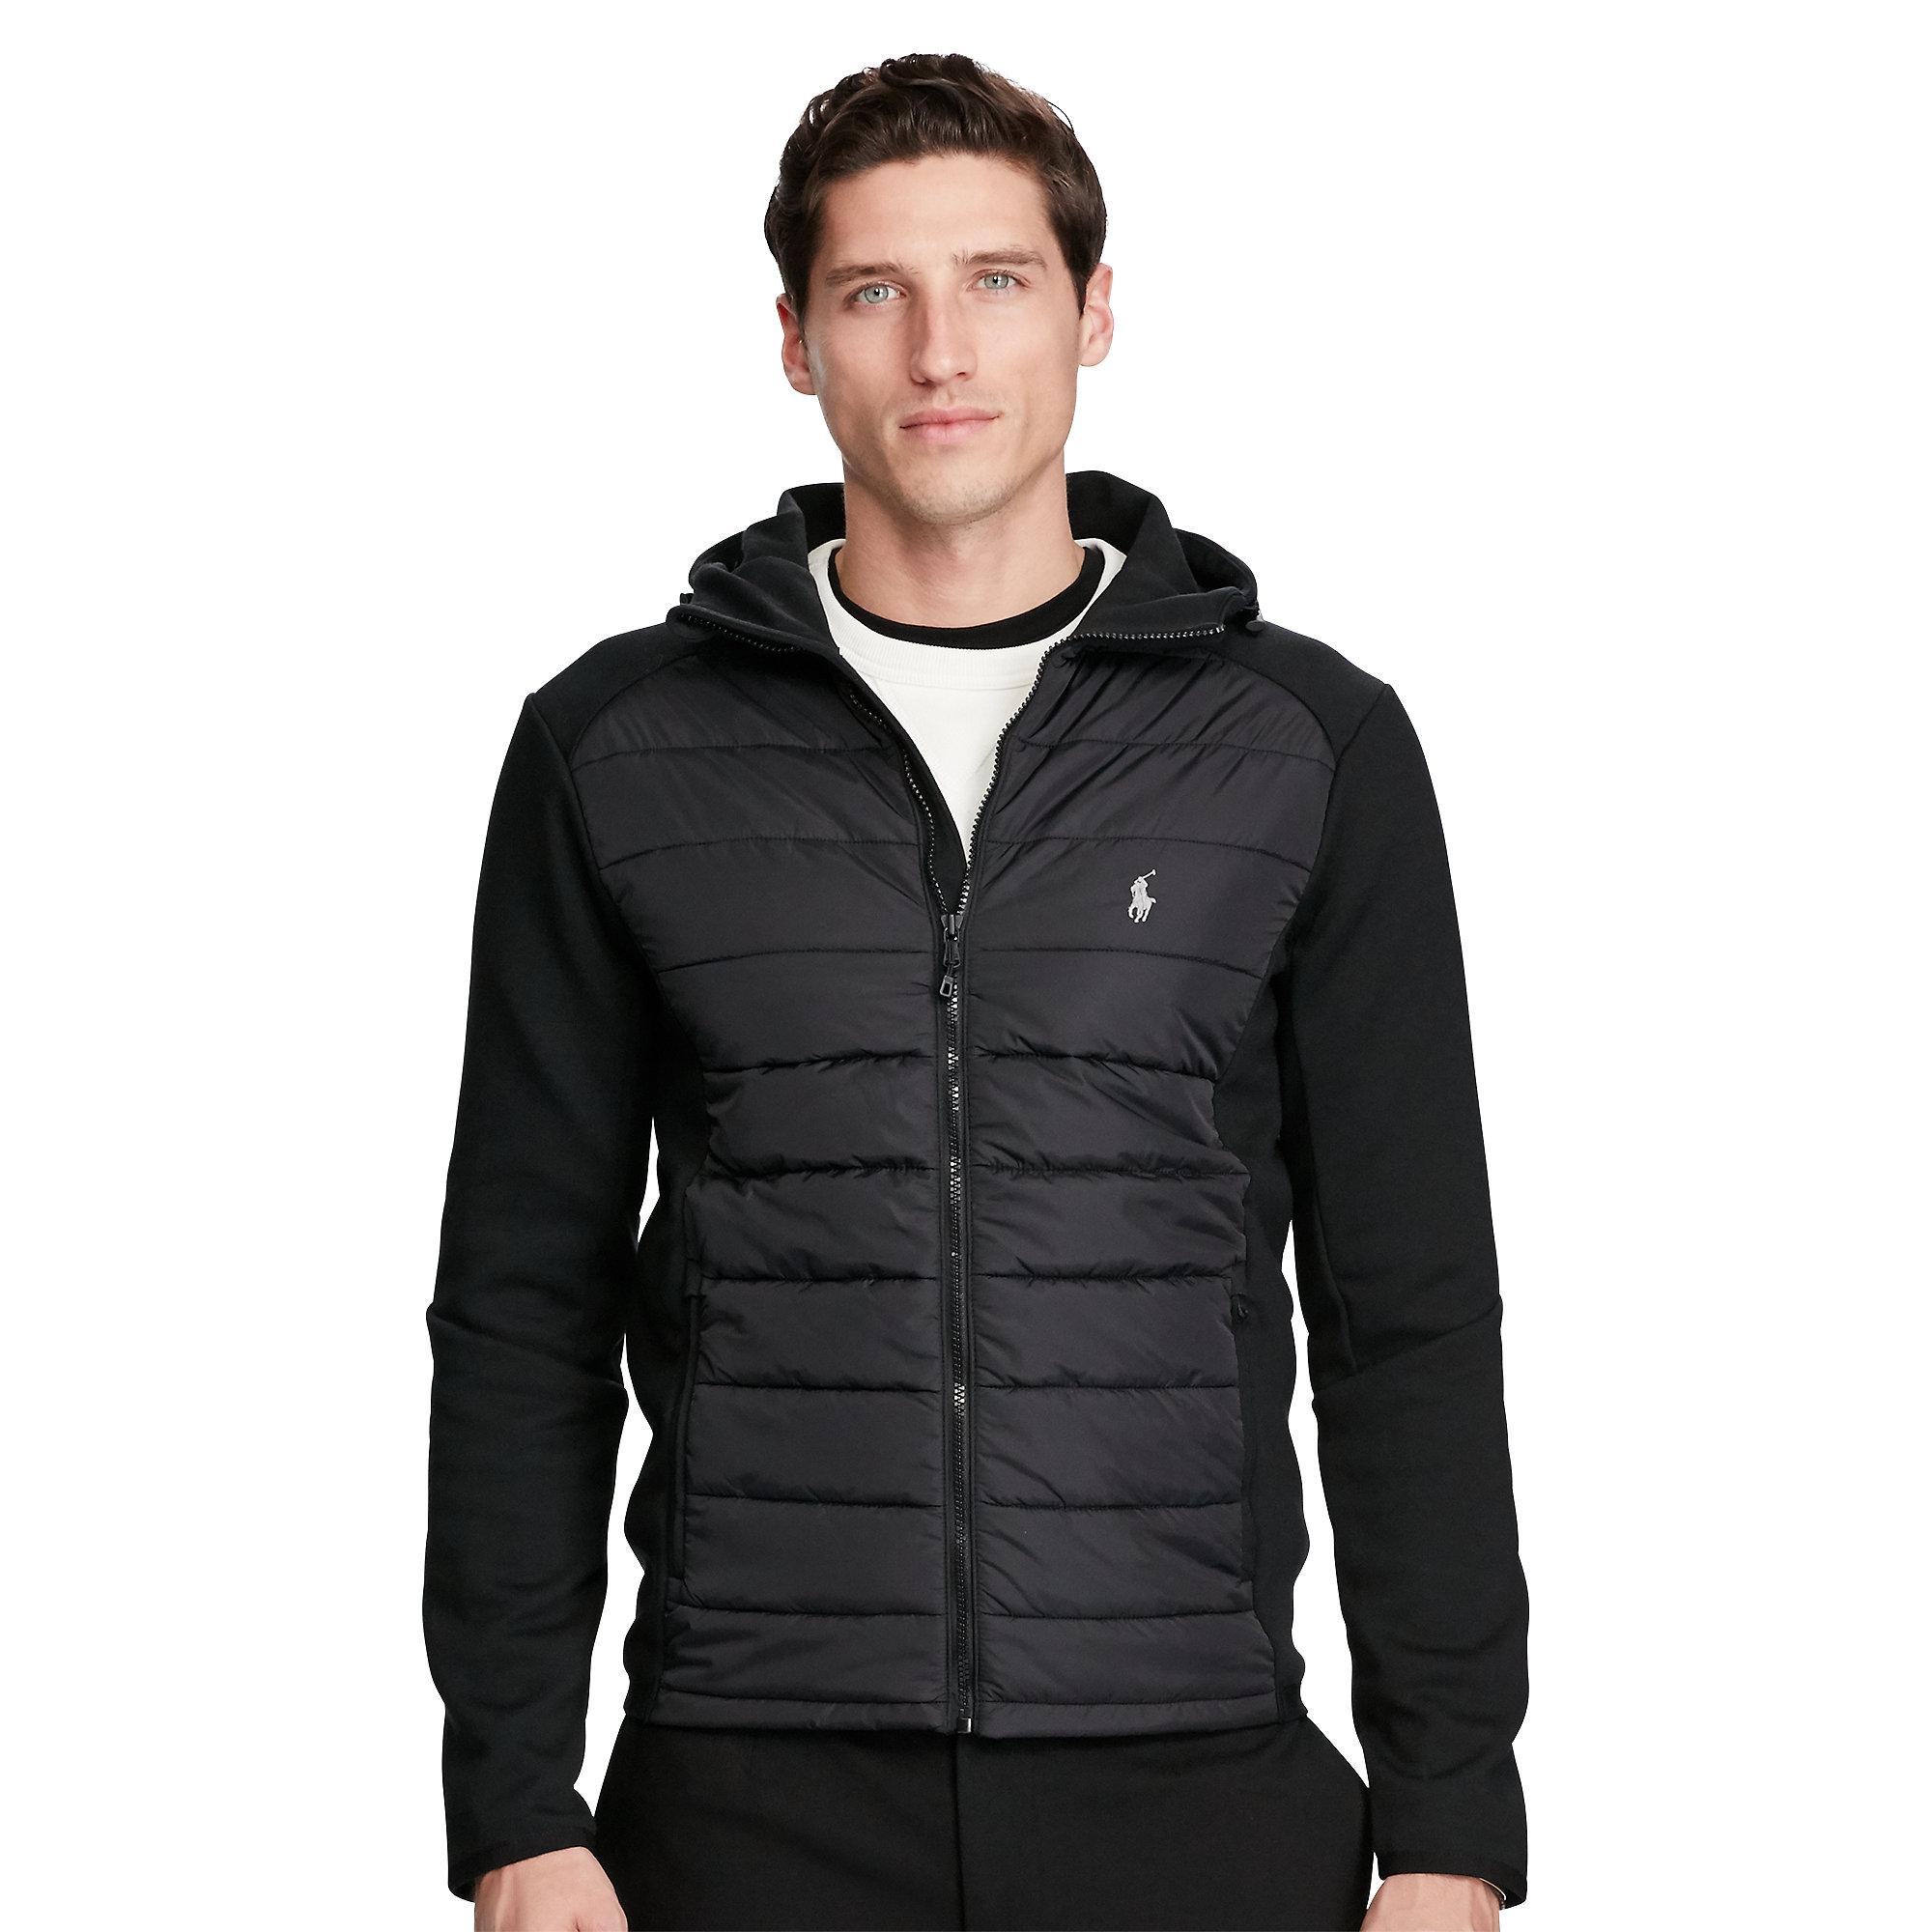 polo ralph lauren paneled full zip hoodie in black for men lyst. Black Bedroom Furniture Sets. Home Design Ideas